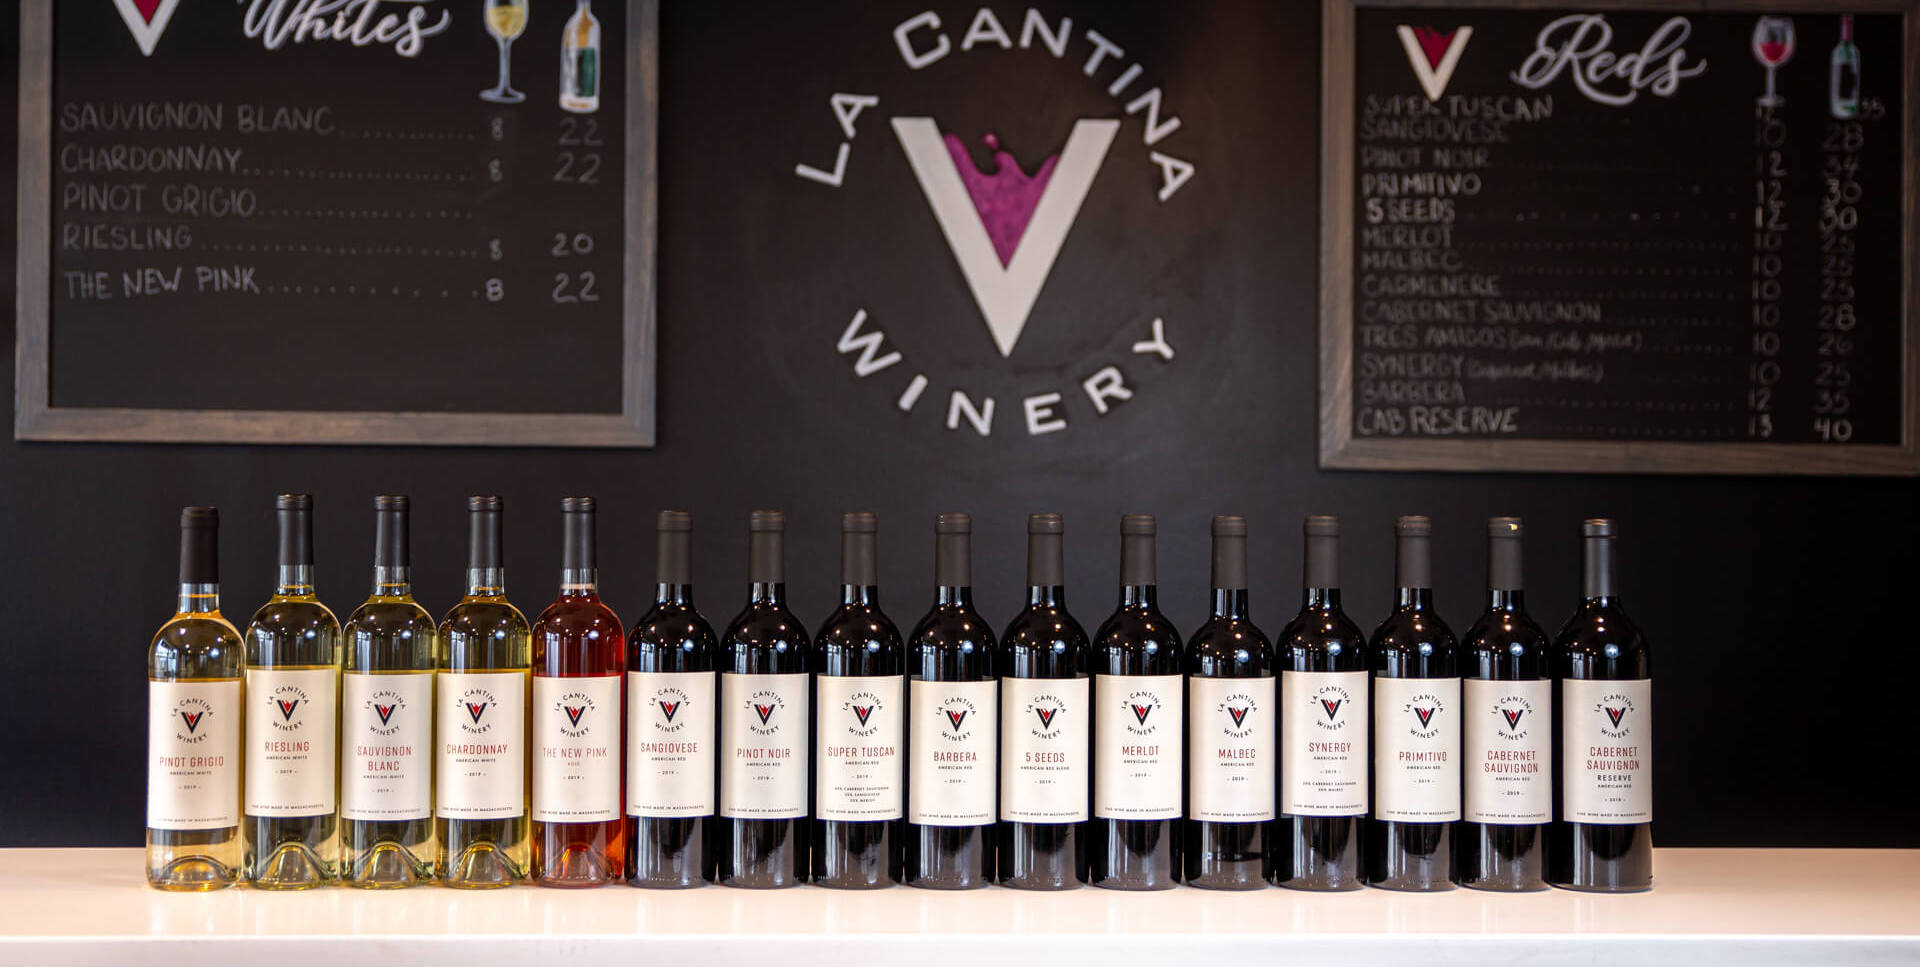 la-cantina-winery-slide-3-wines copy